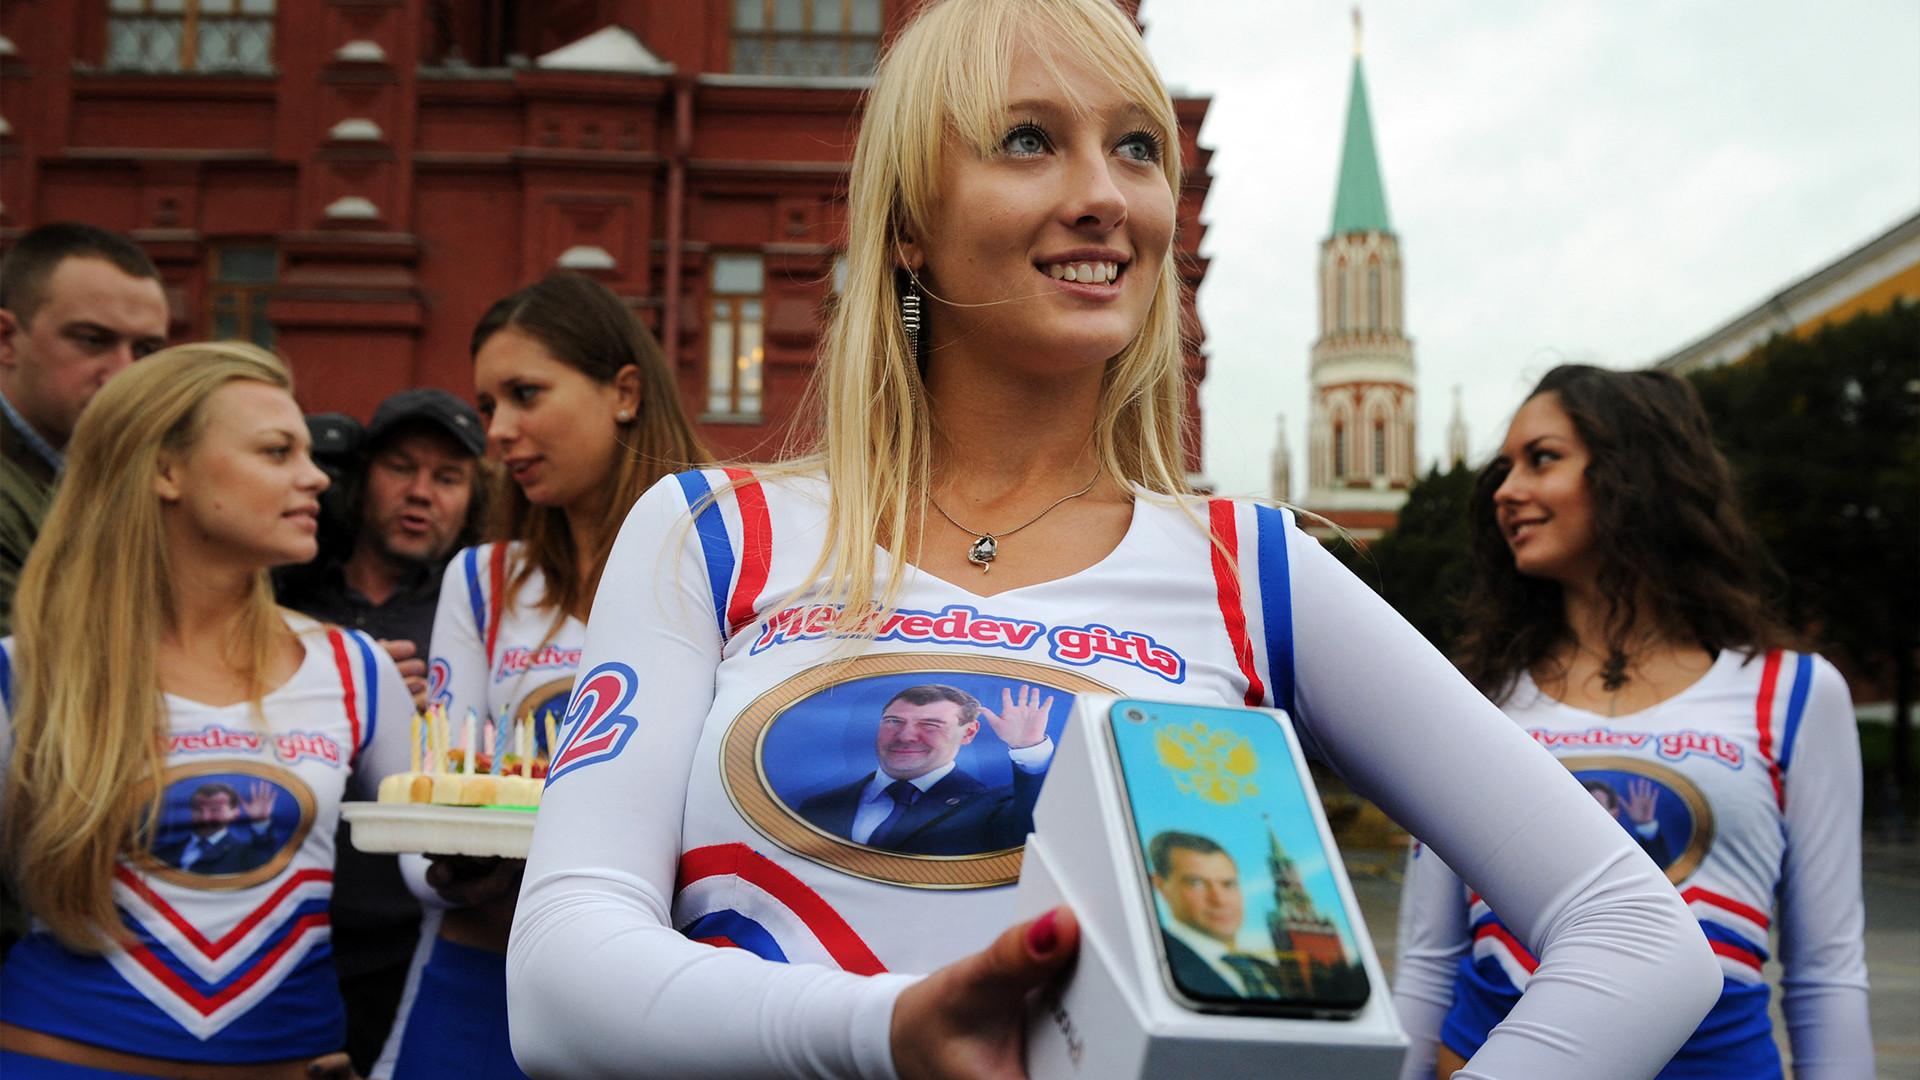 'Medvedev Girls' merayakan ulang tahun Presiden Dmitry Medvedev.